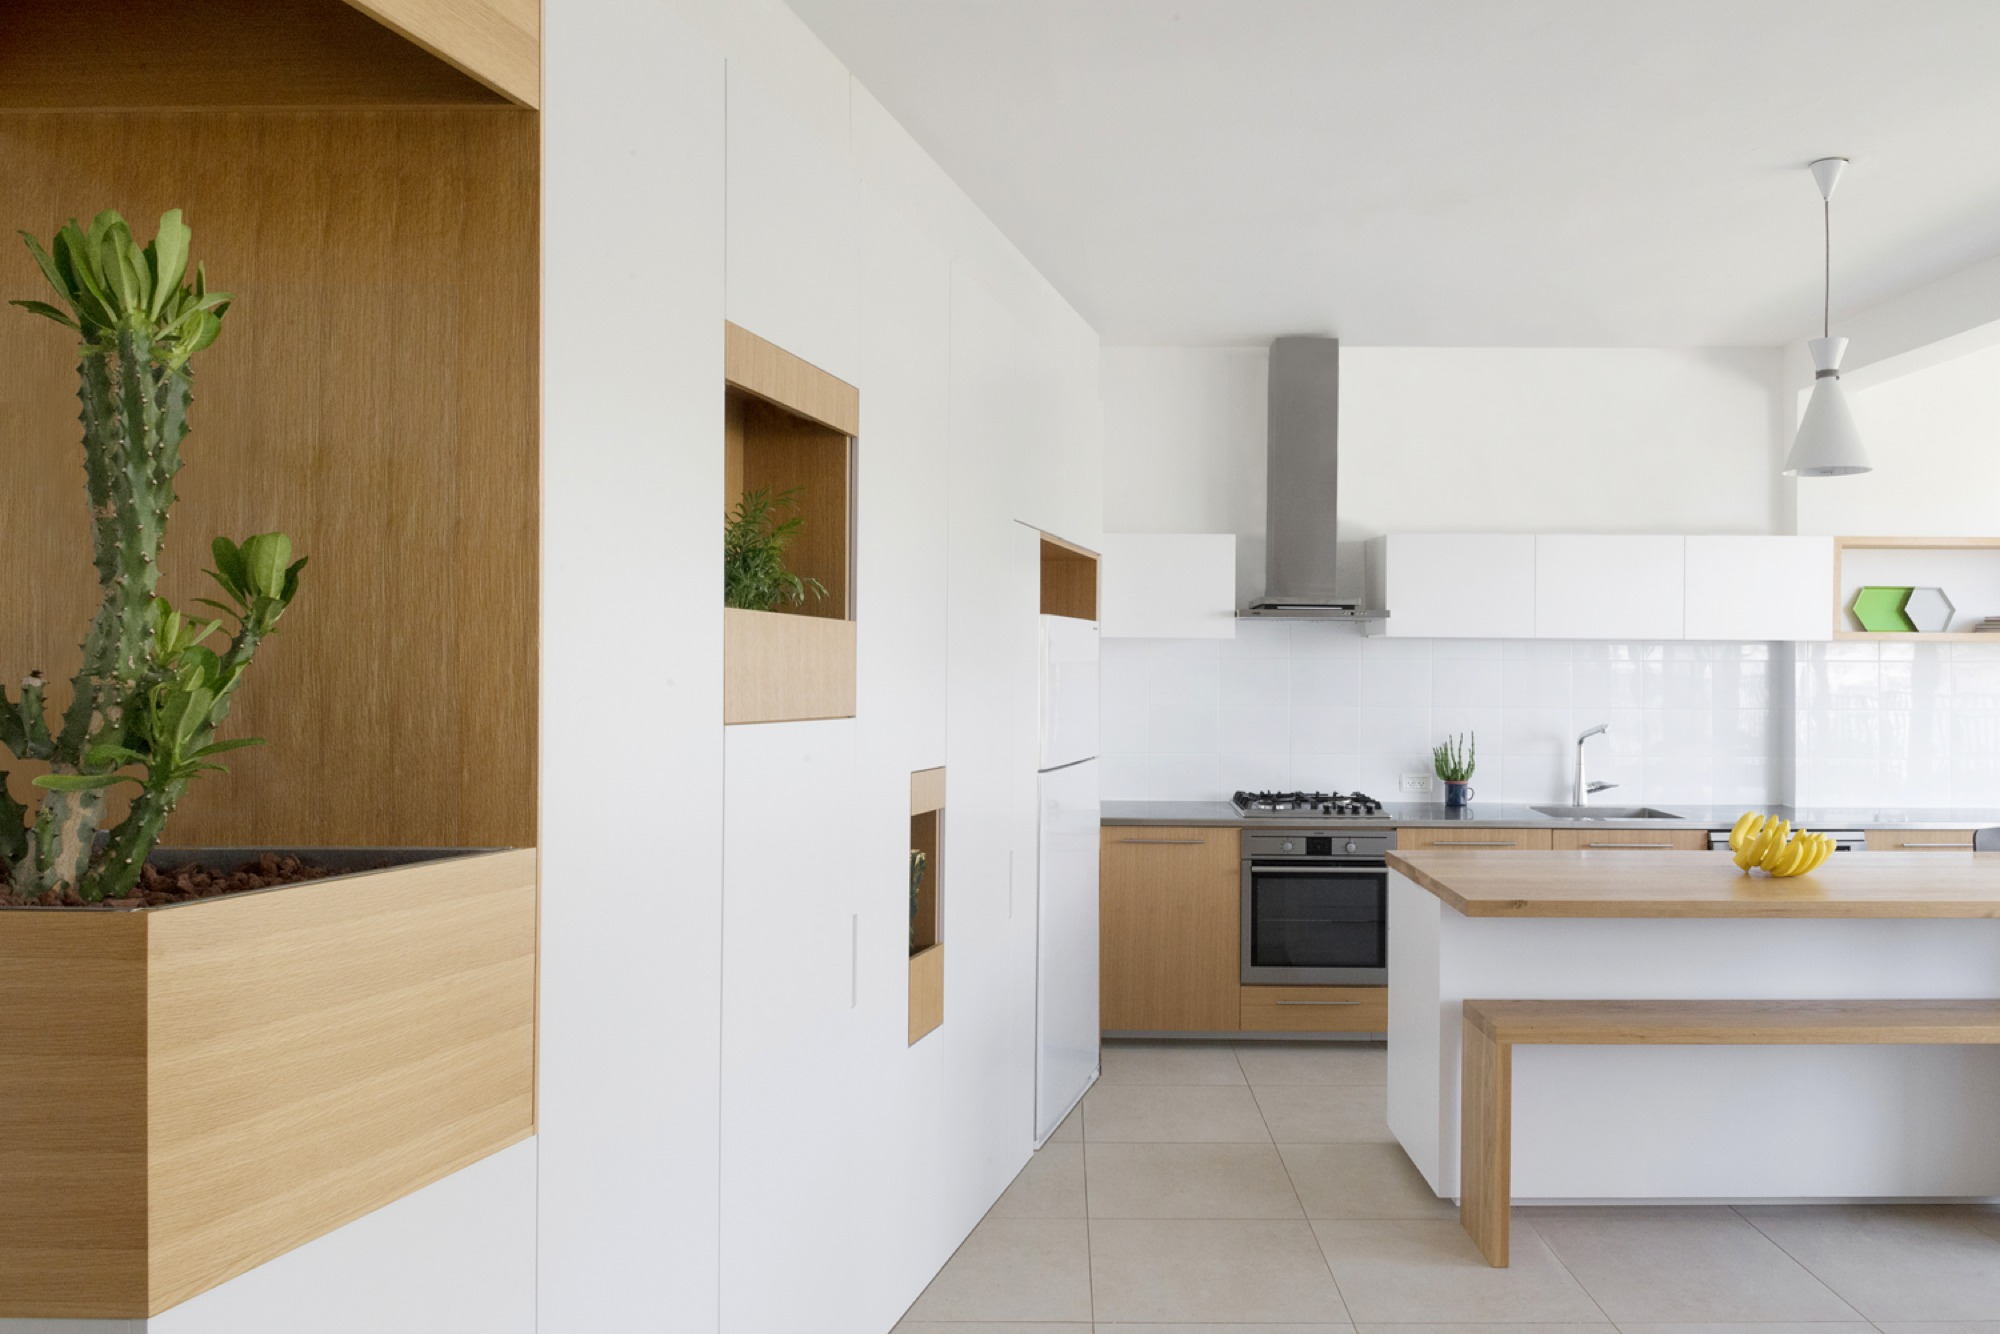 Apartment in ramat gan itai palti archdaily - Apartment decorating websites ...